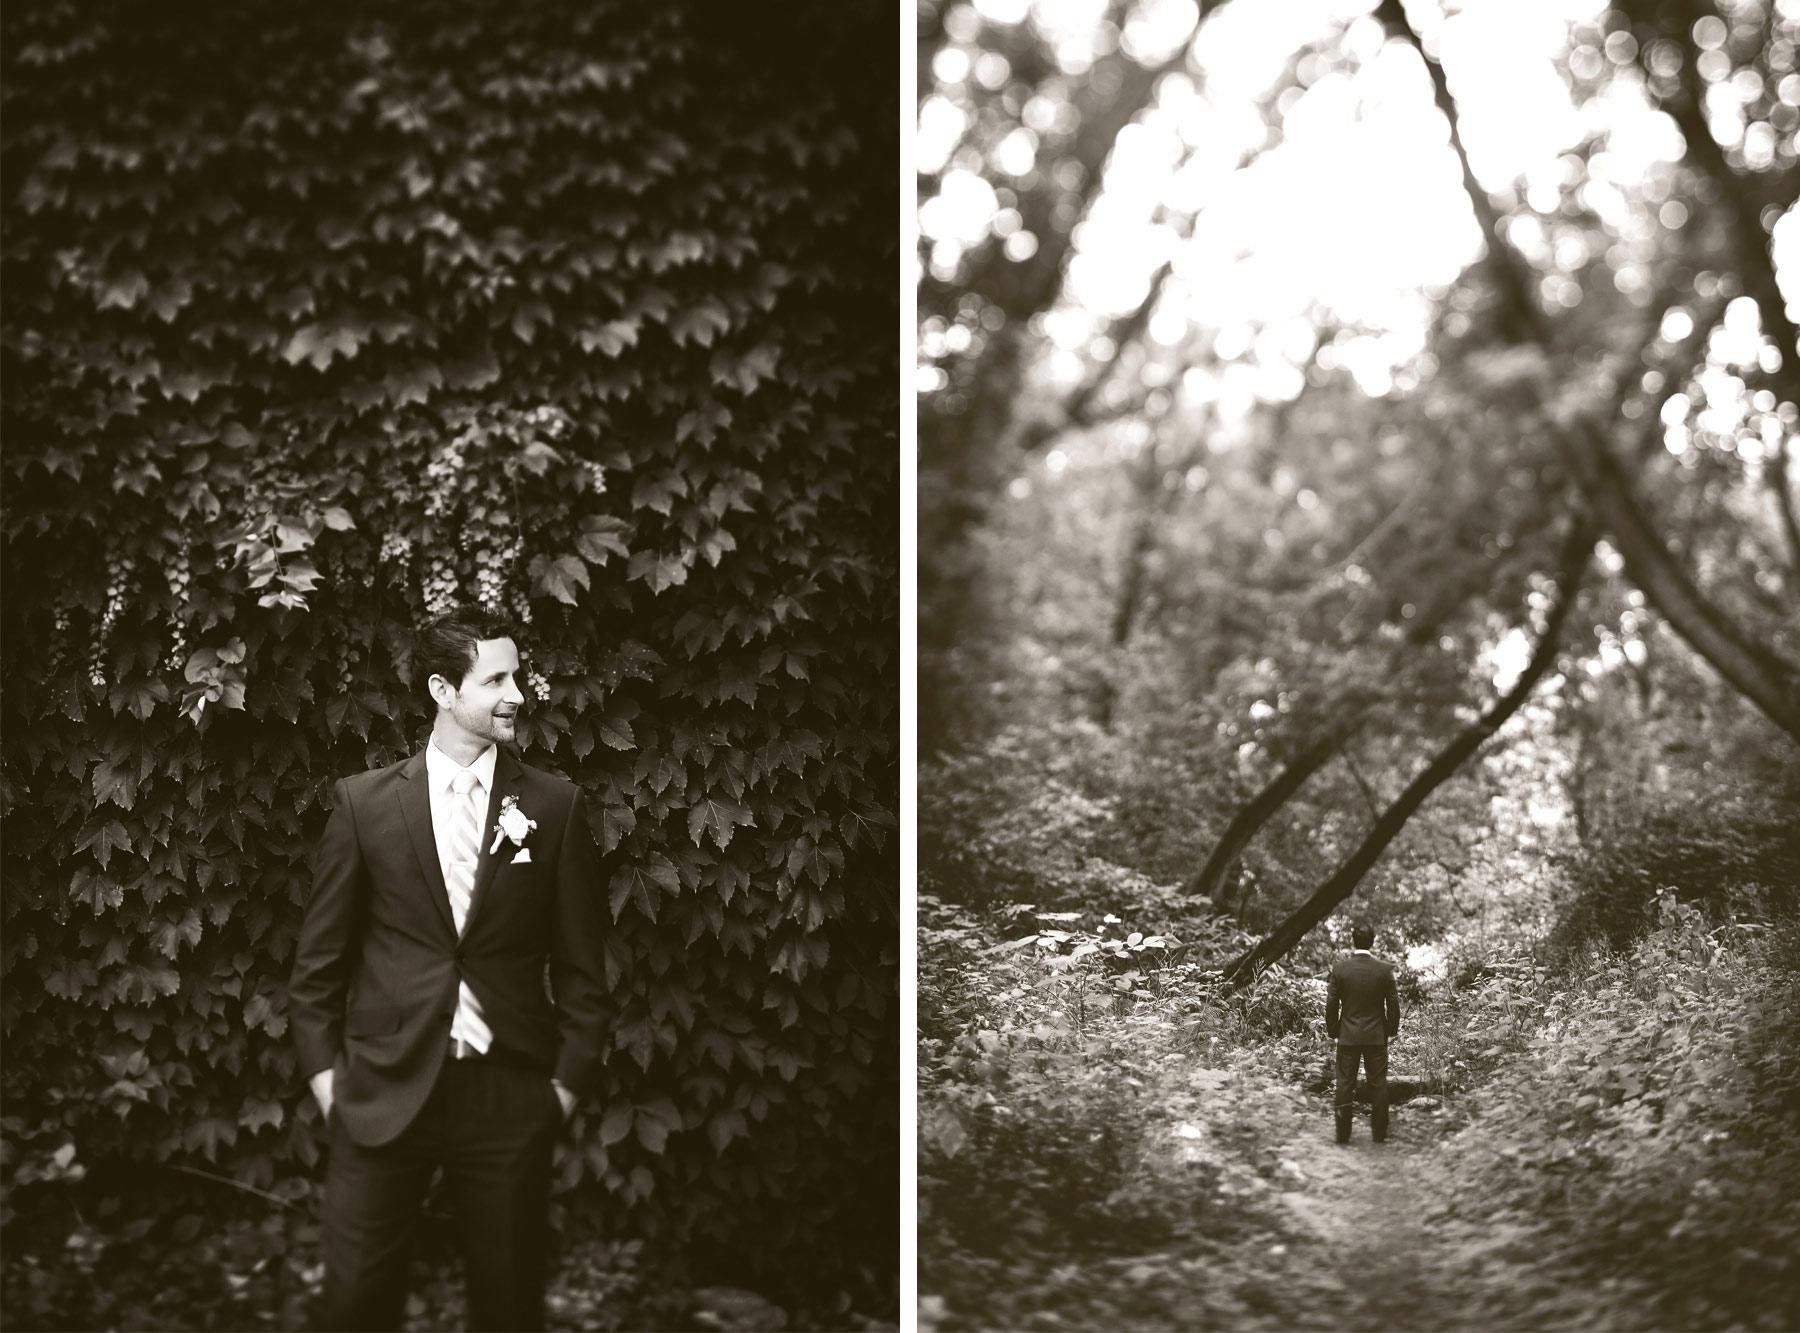 02-Stillwater-Minnesota-Wedding-Photography-by-Vick-Photography-Camrose-Hill-Outdoor-Woods-Rustic-Groom-Tina-&-Eric.jpg